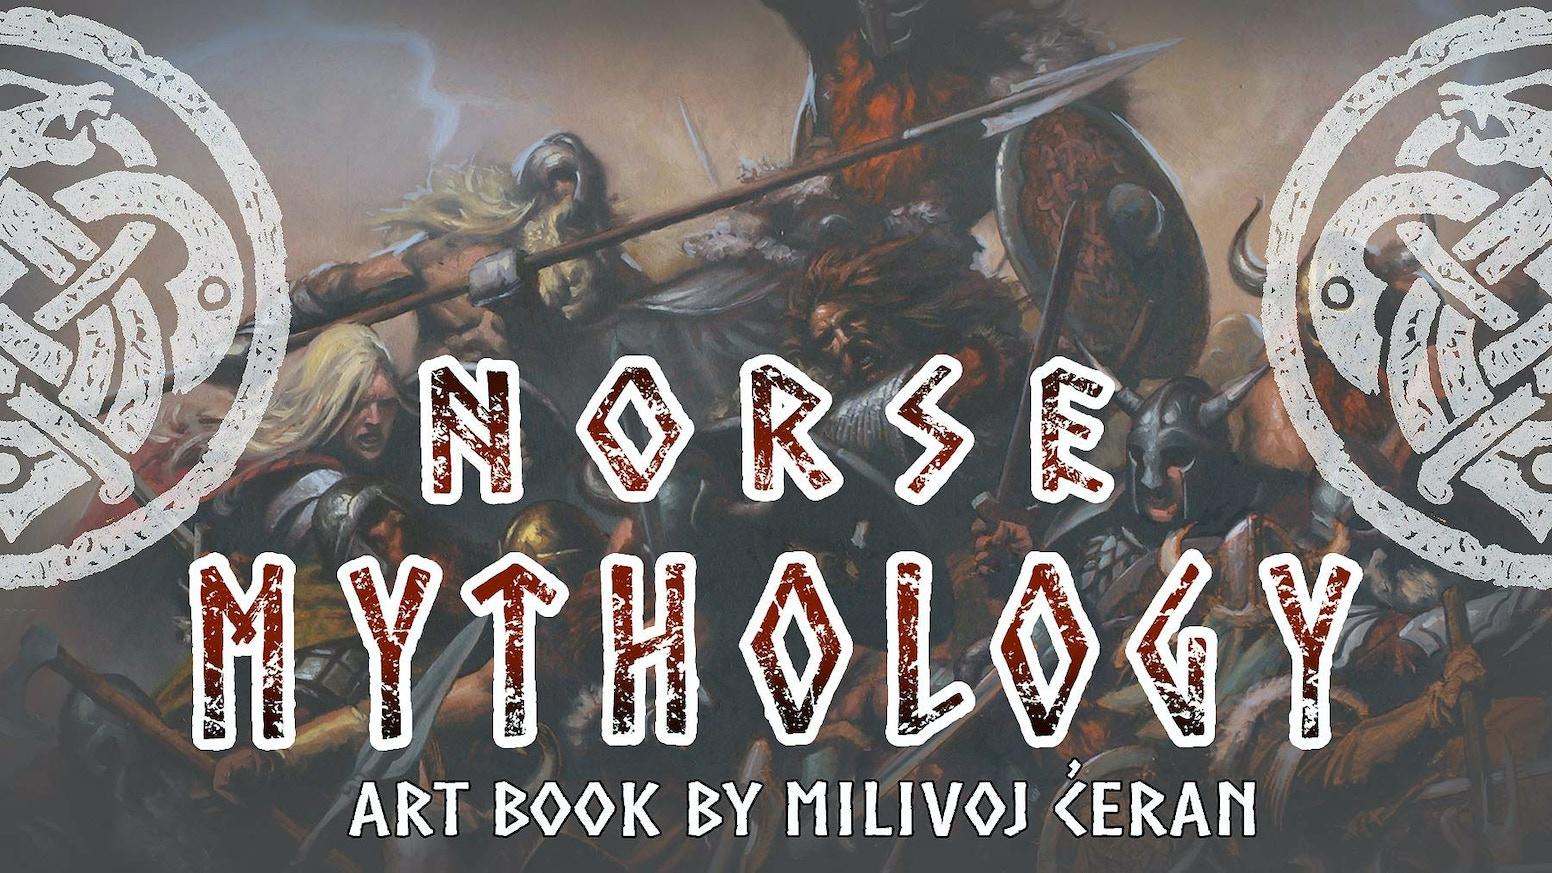 Breathtaking artbook based on Norse mythology, by award-winning illustrator, Milivoj Ćeran